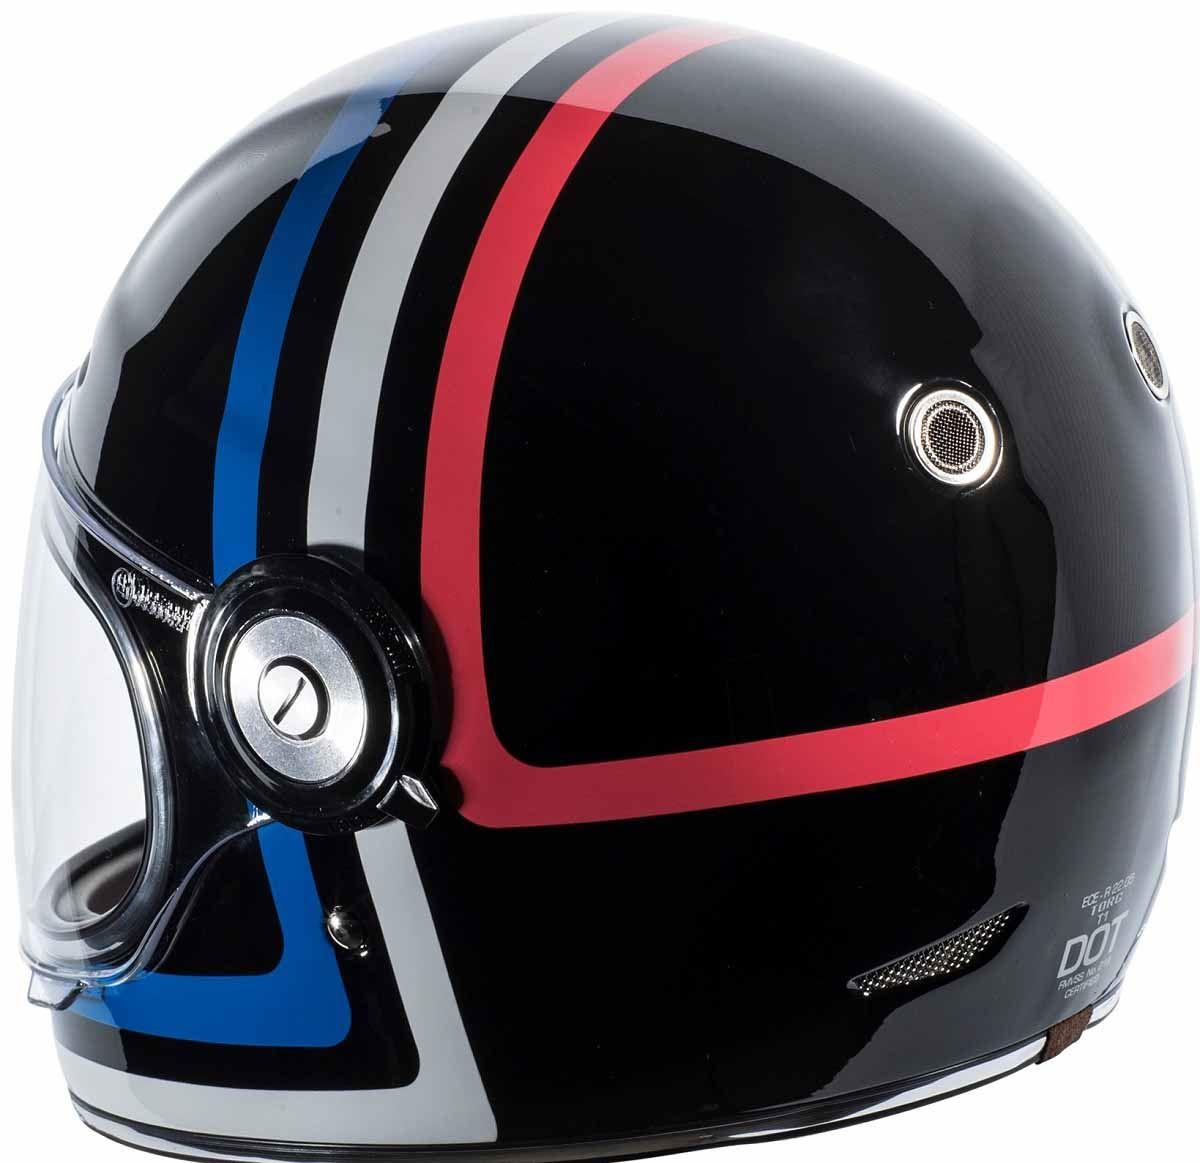 miniature 15 - Torc T1 Helmet Retro Vintage Style Fiberglass DOT Approved XS-2XL